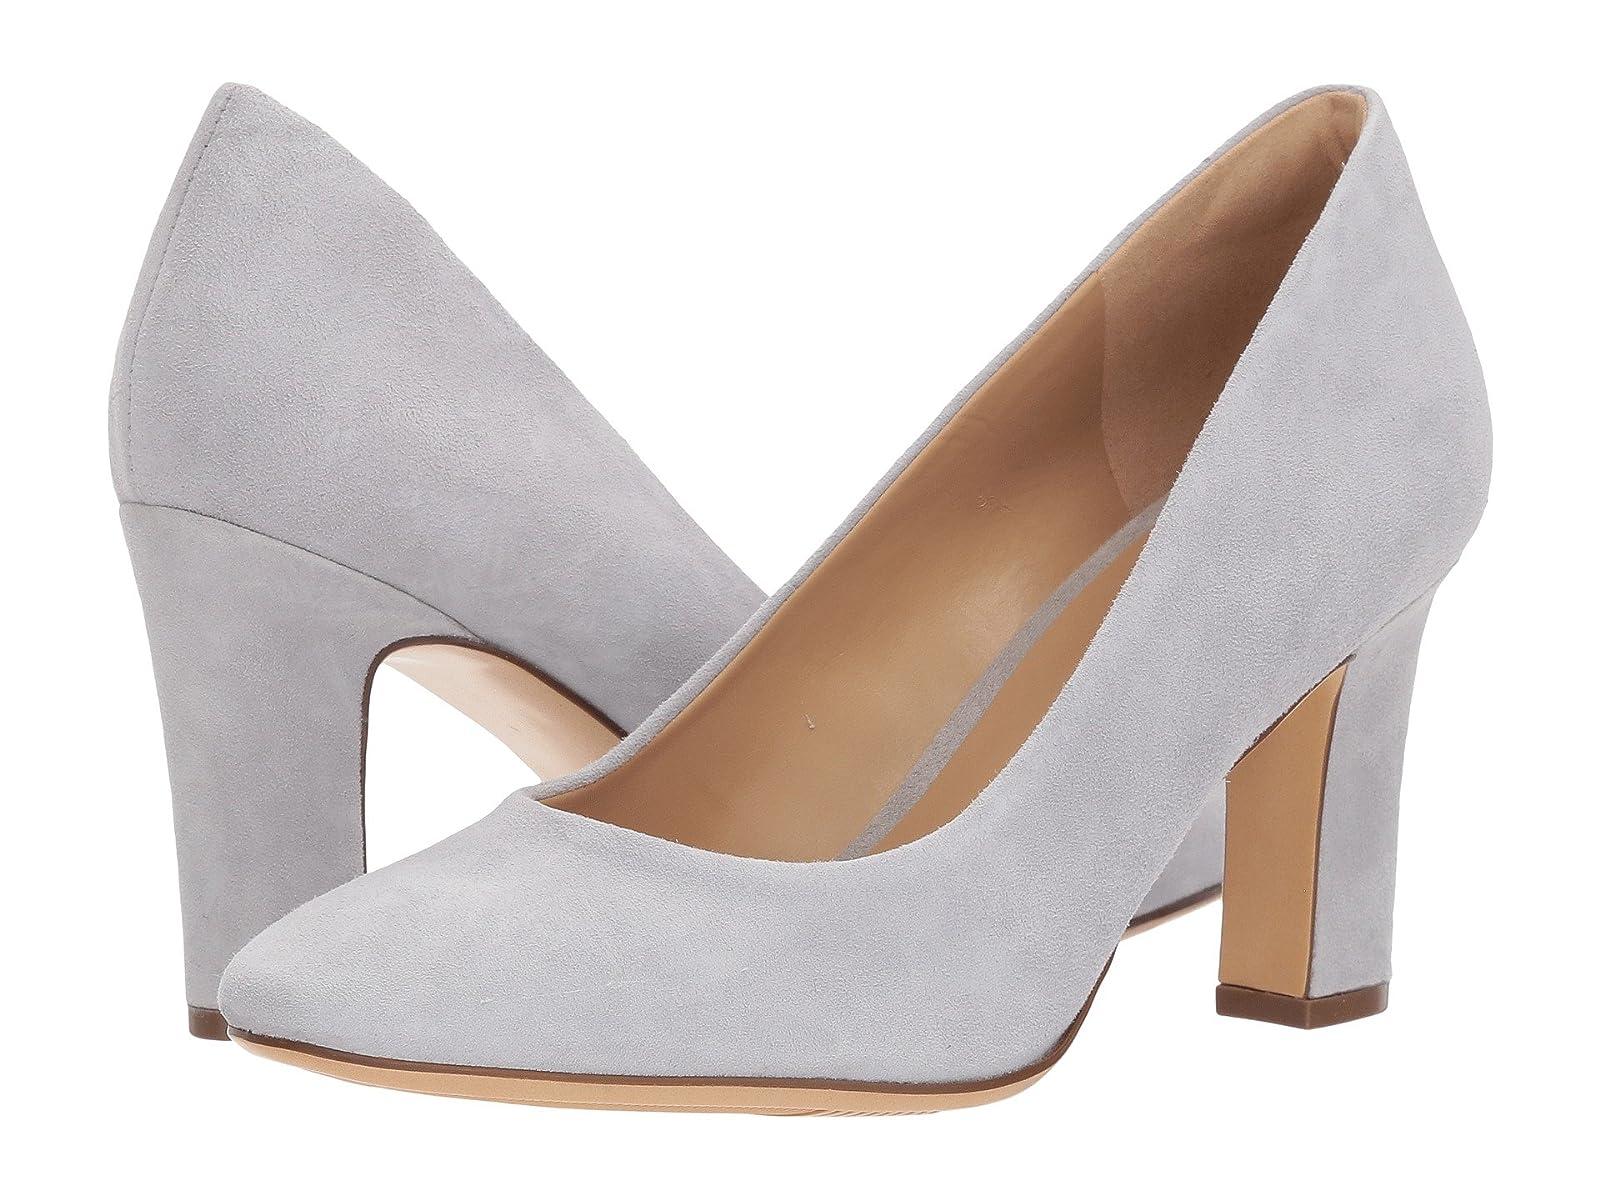 Naturalizer GloriaCheap and distinctive eye-catching shoes